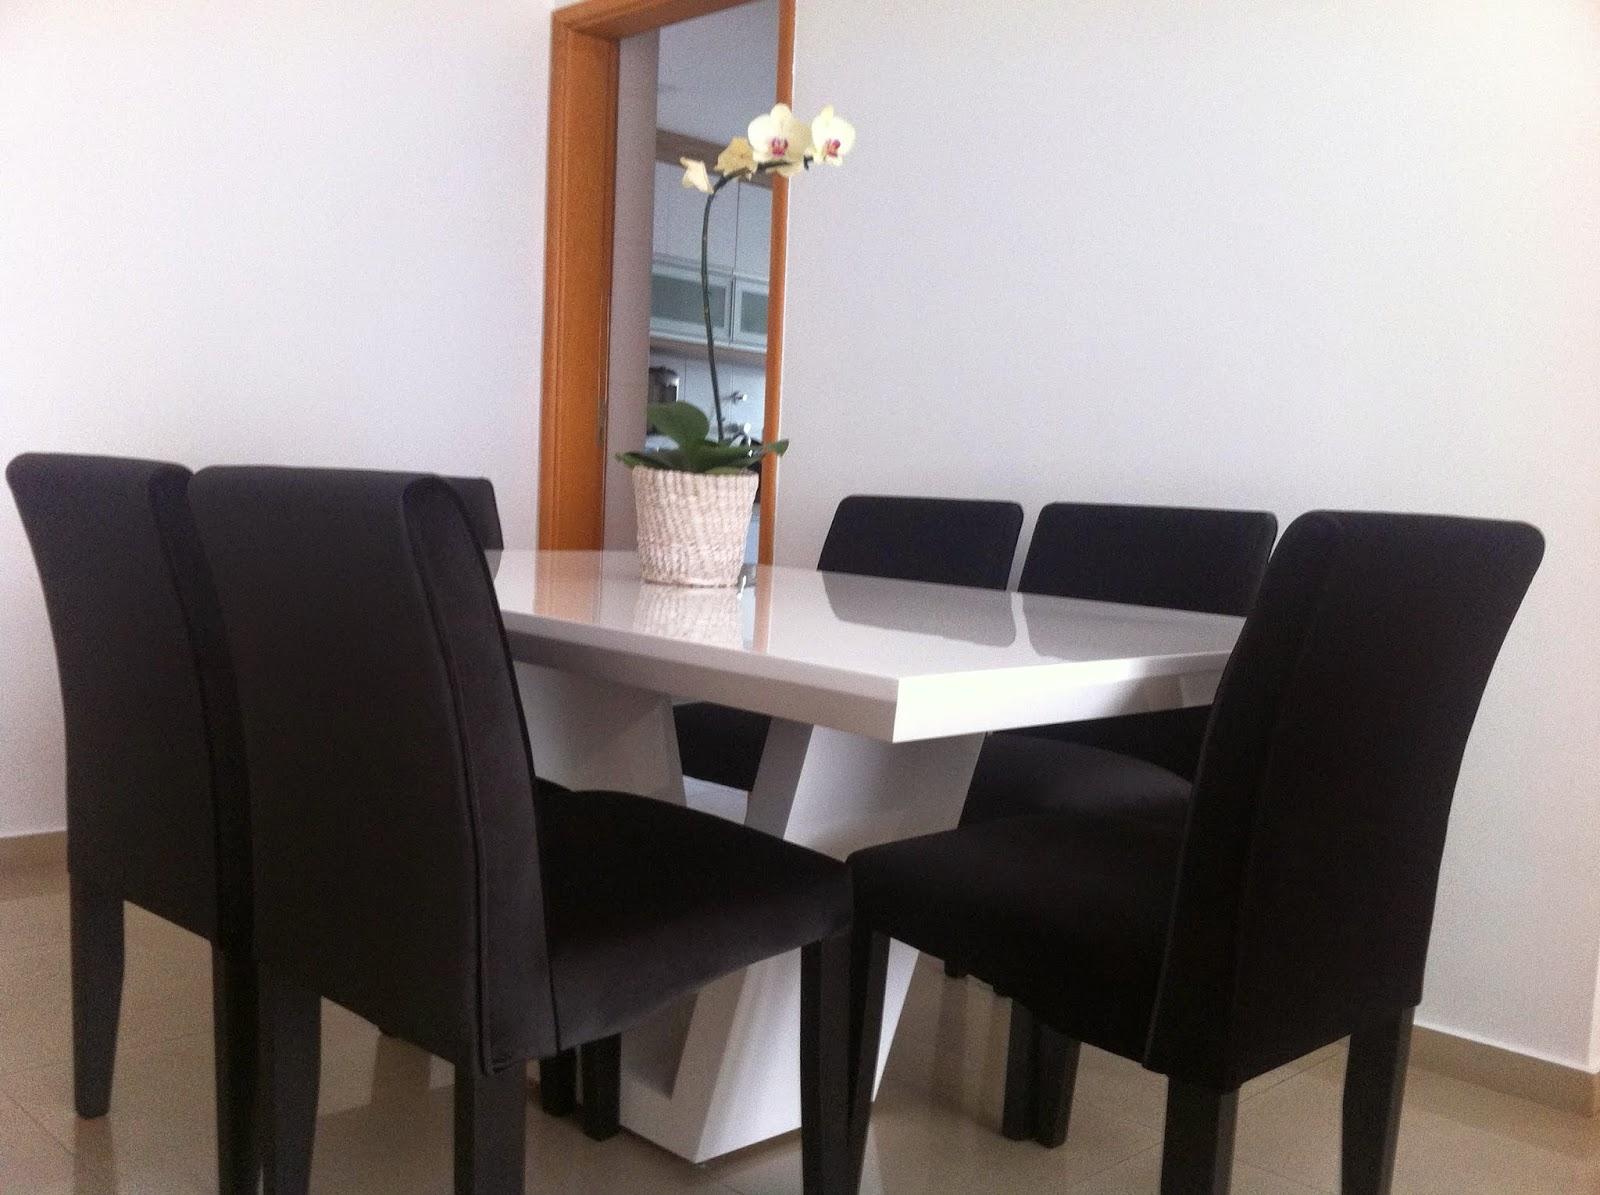 Pruzak Com Sala De Jantar Pequena Com Mesa De Marmore Id Ias  -> Sala De Jantar Pequena Com Mesa De Marmore